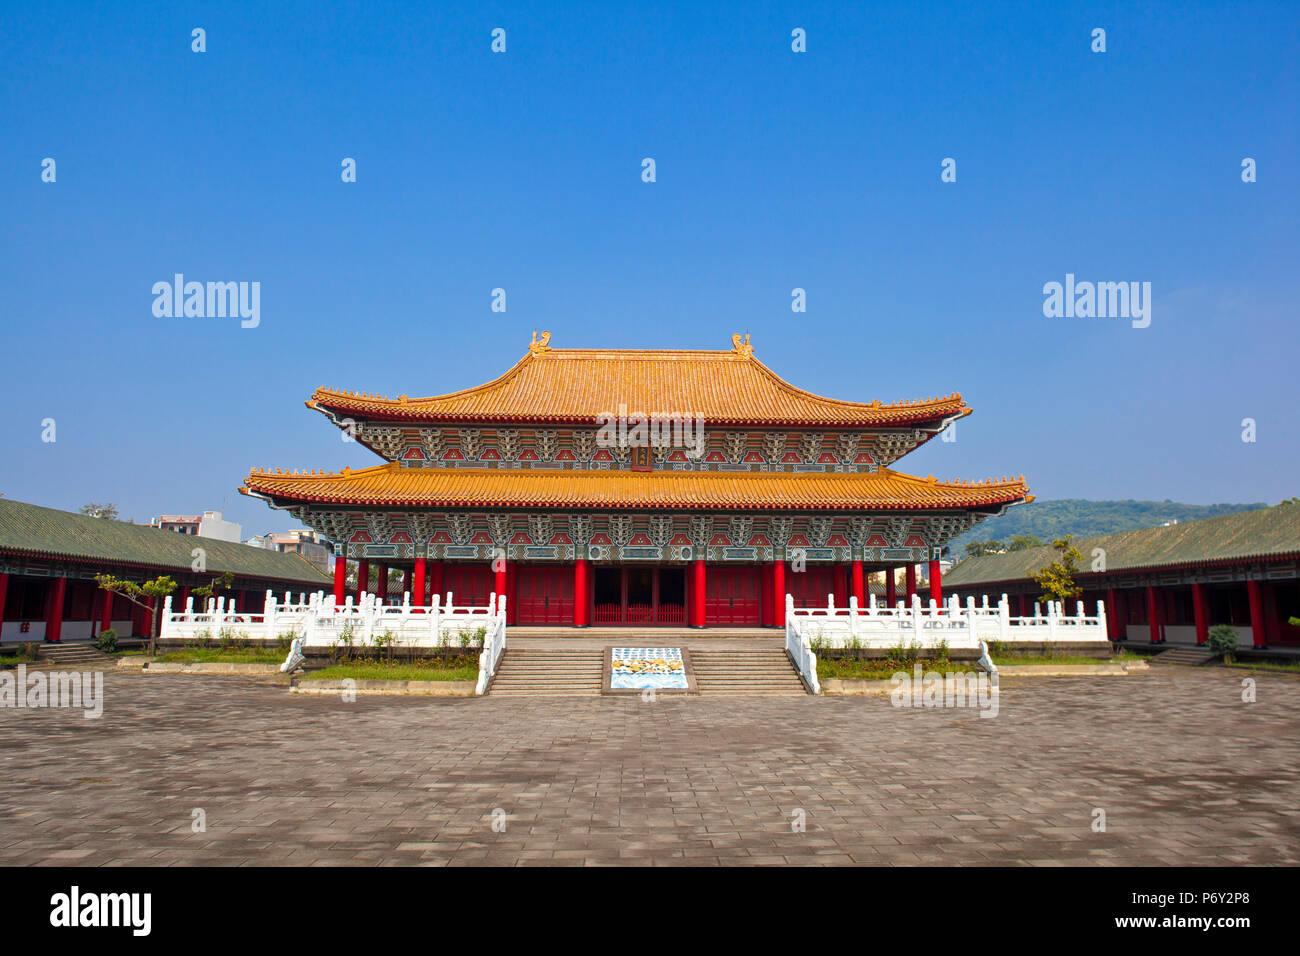 Taiwan, Kaohsiung Zuoying, étang de lotus, du Temple de Confucius Photo Stock